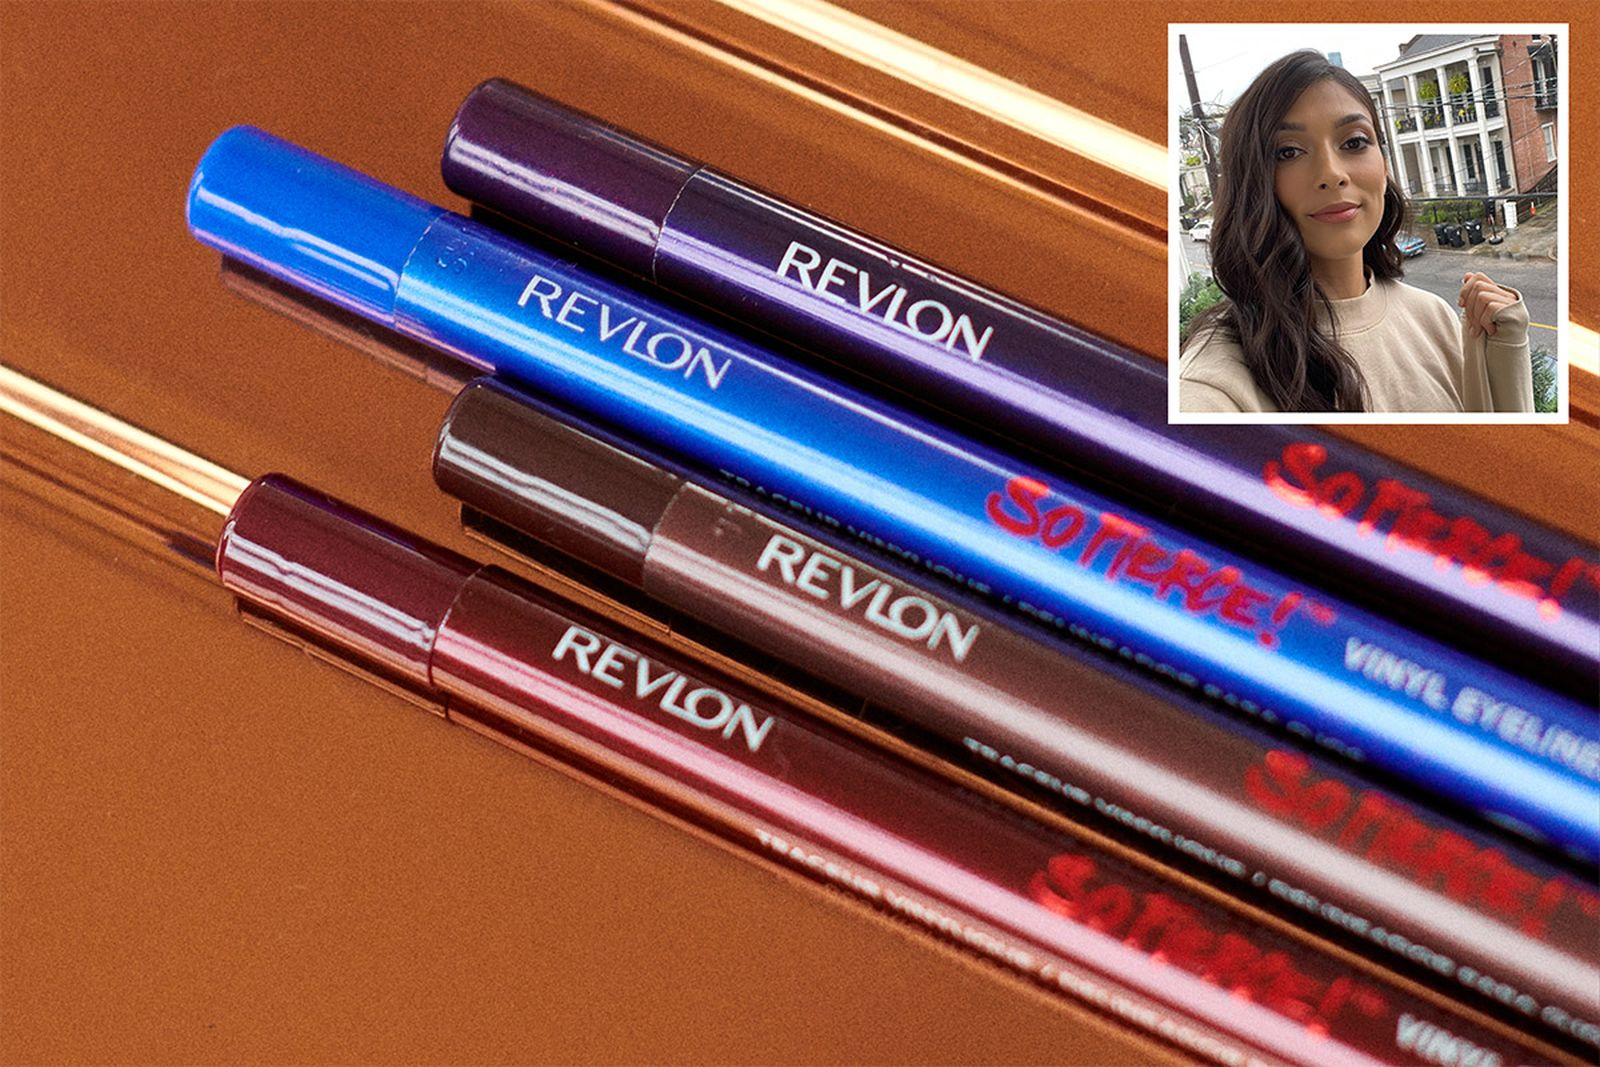 Revlon-03